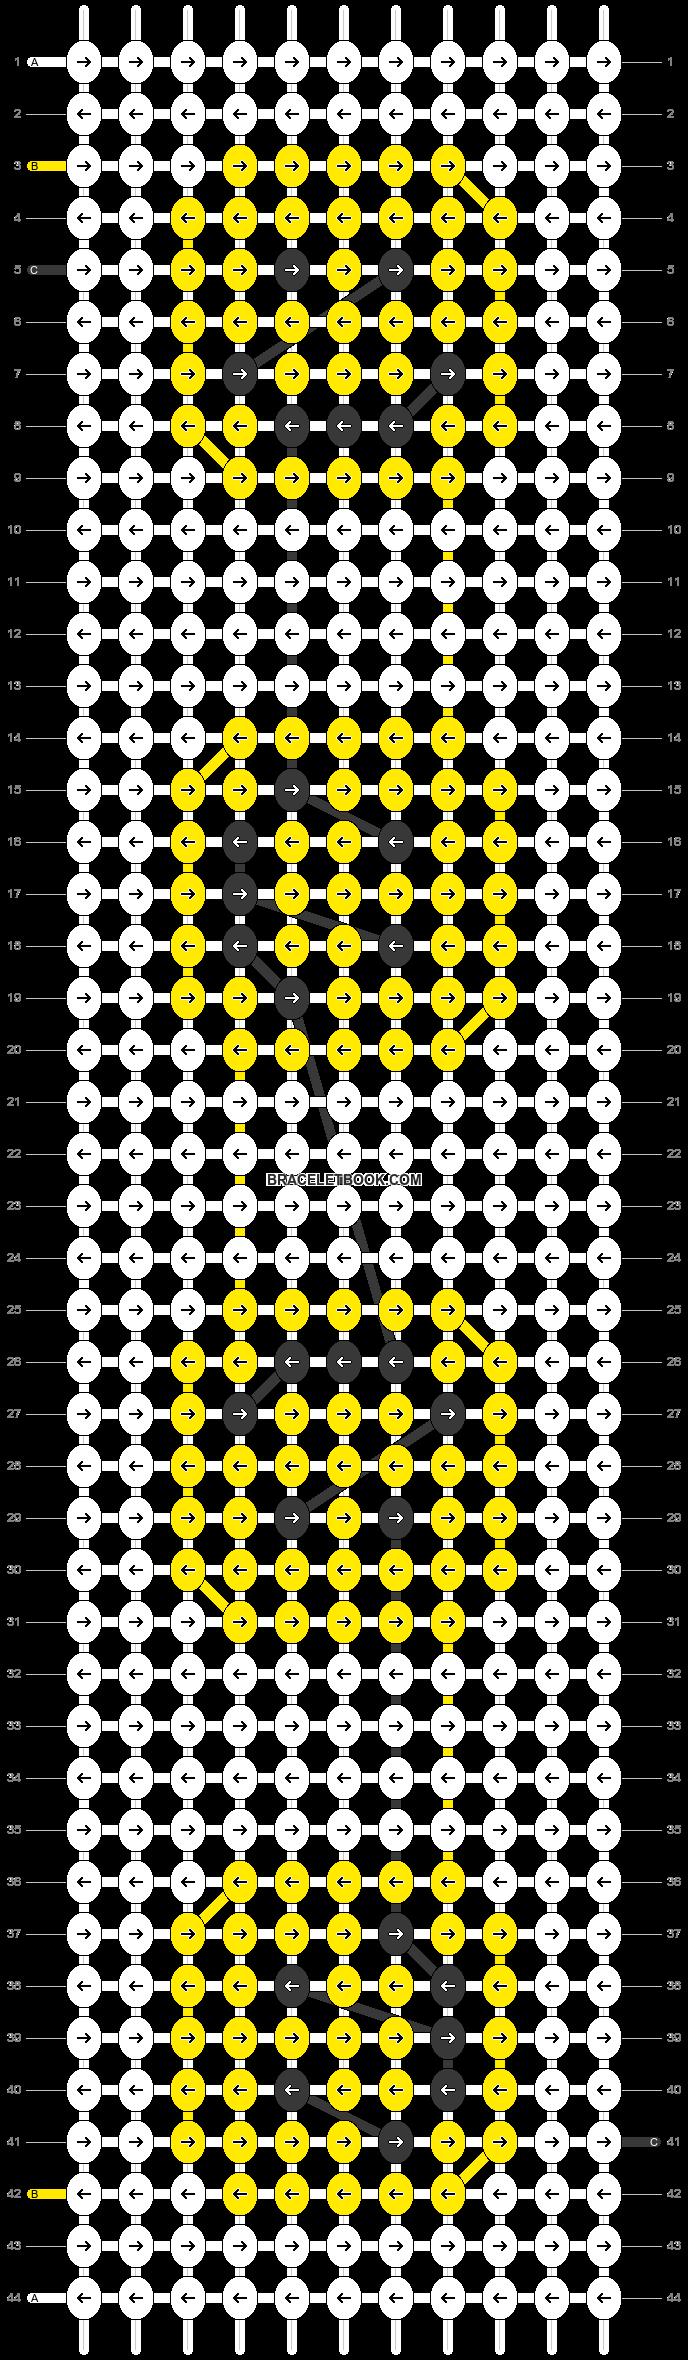 Alpha pattern #25864 pattern